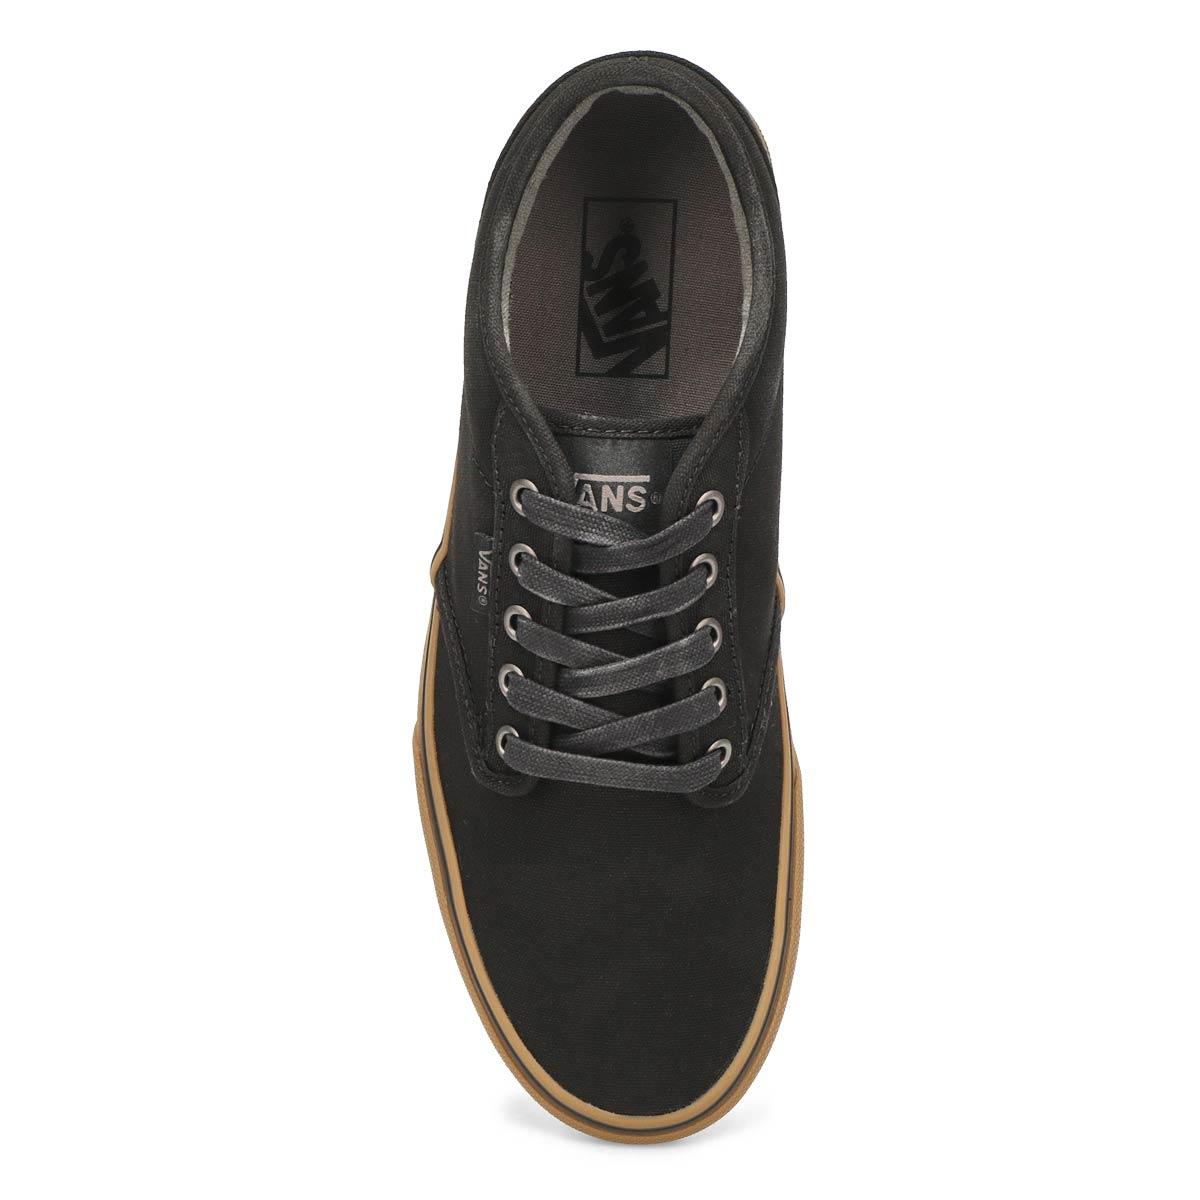 Men's Atwood Sneaker - Black/Gum